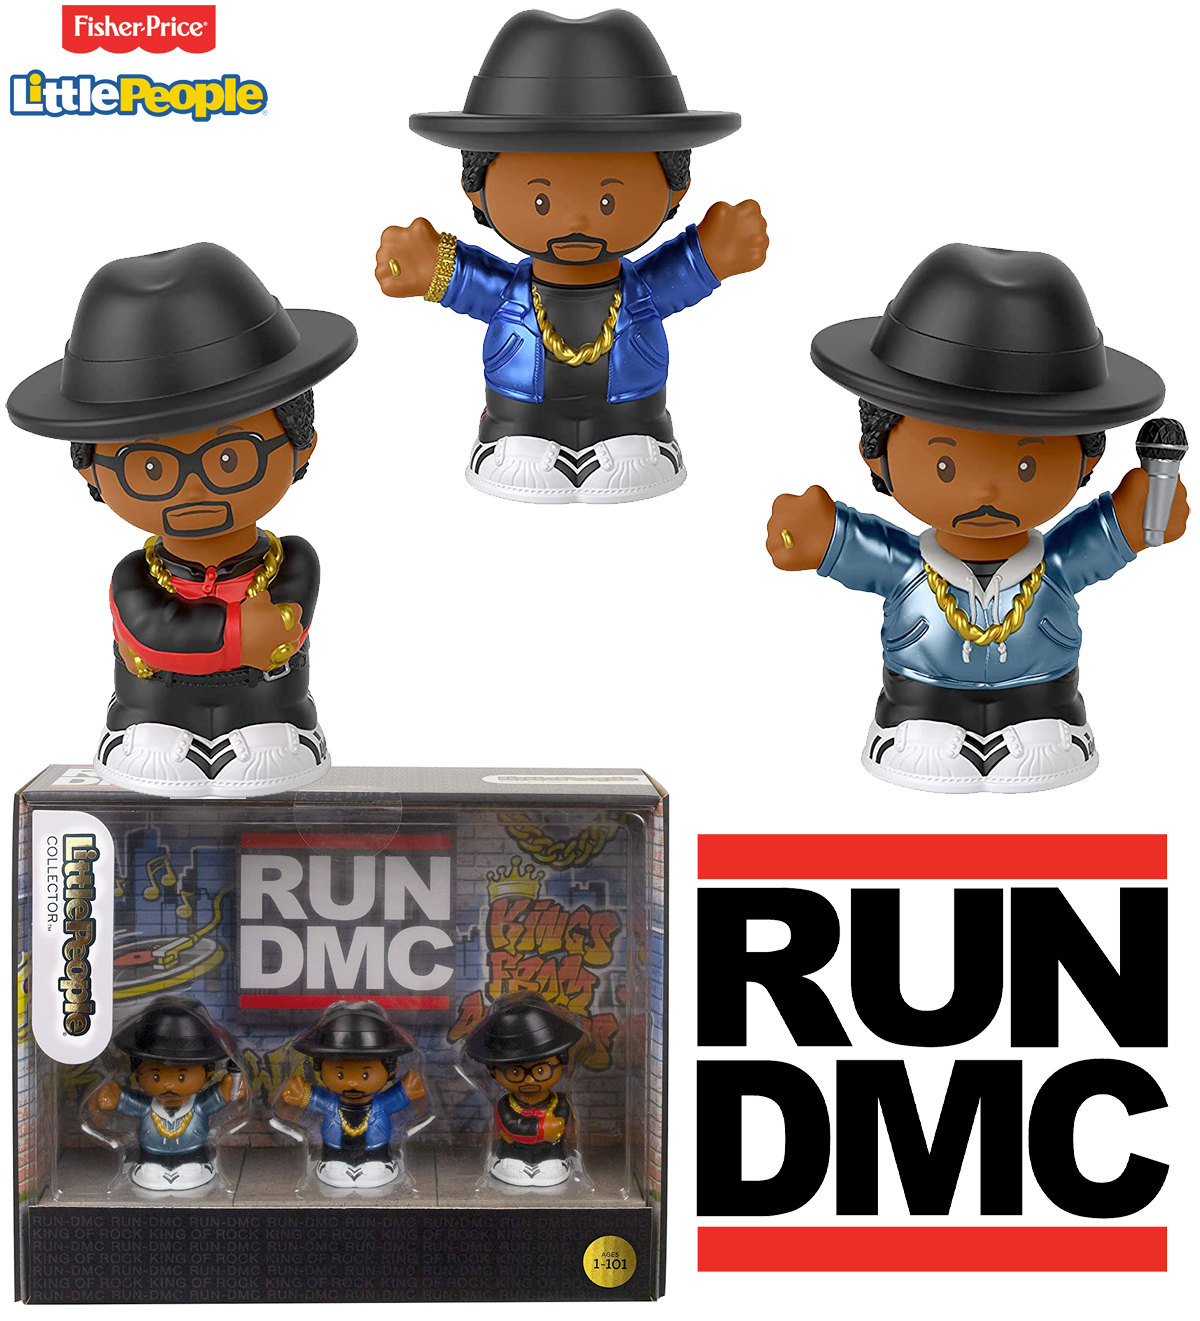 Bonecos Run-D.M.C. Little People Collector (Fisher-Price)